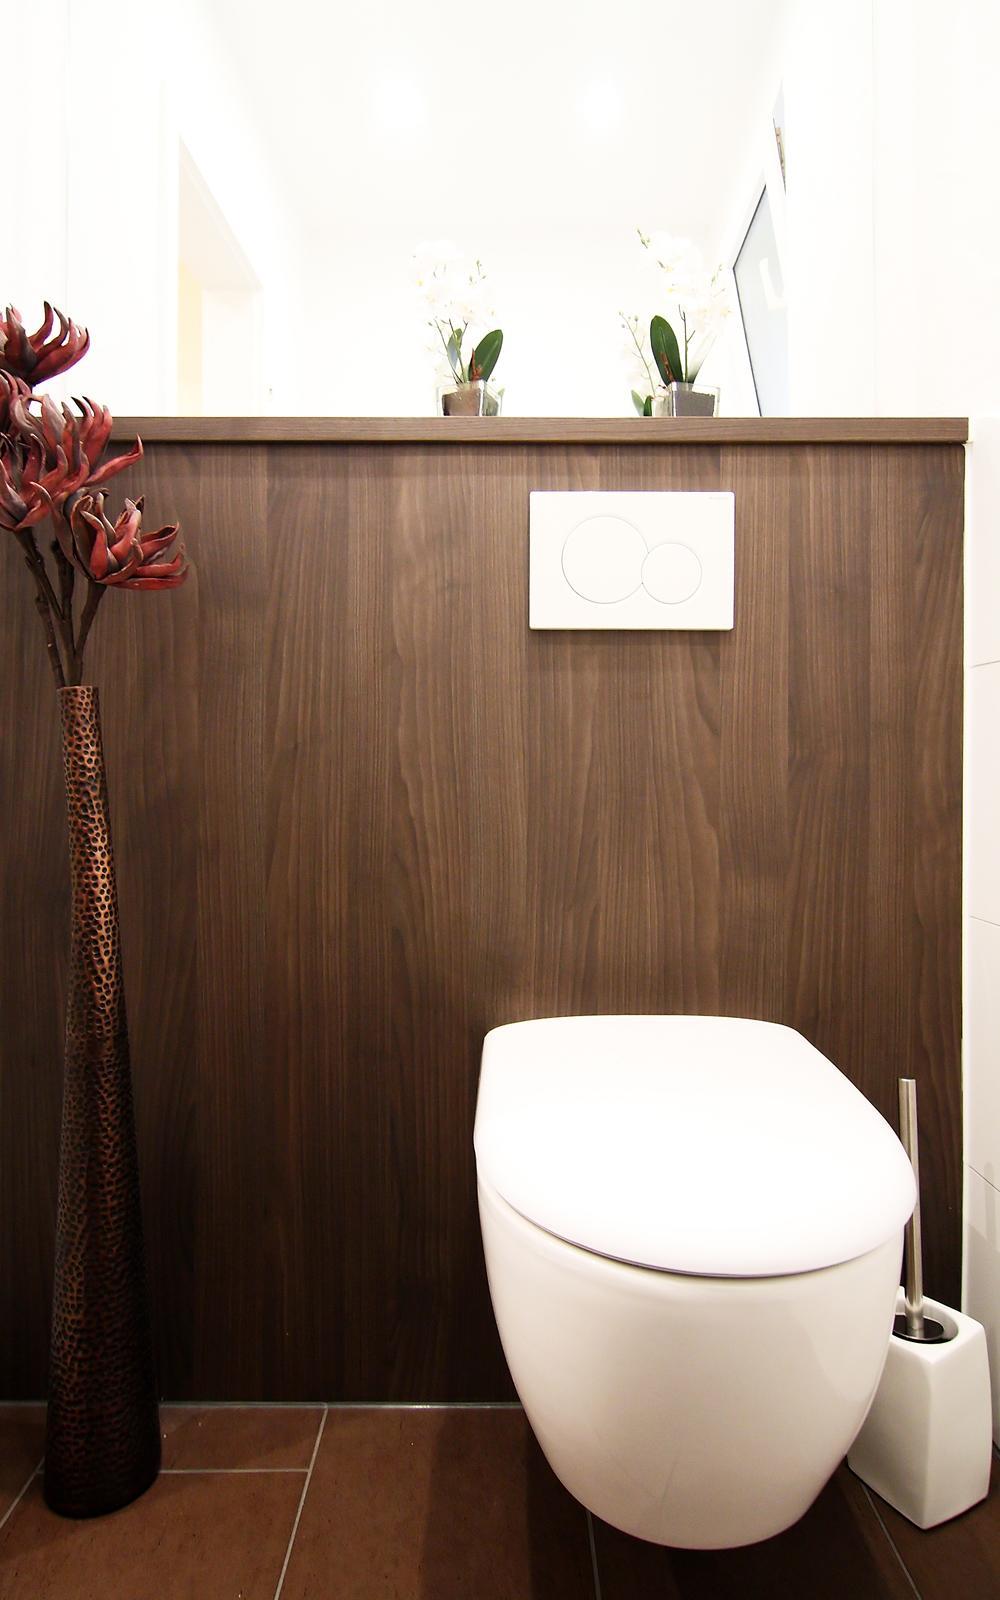 gaeste wc mit charme st bler eislingen landkreis g ppingen badrenovierung. Black Bedroom Furniture Sets. Home Design Ideas